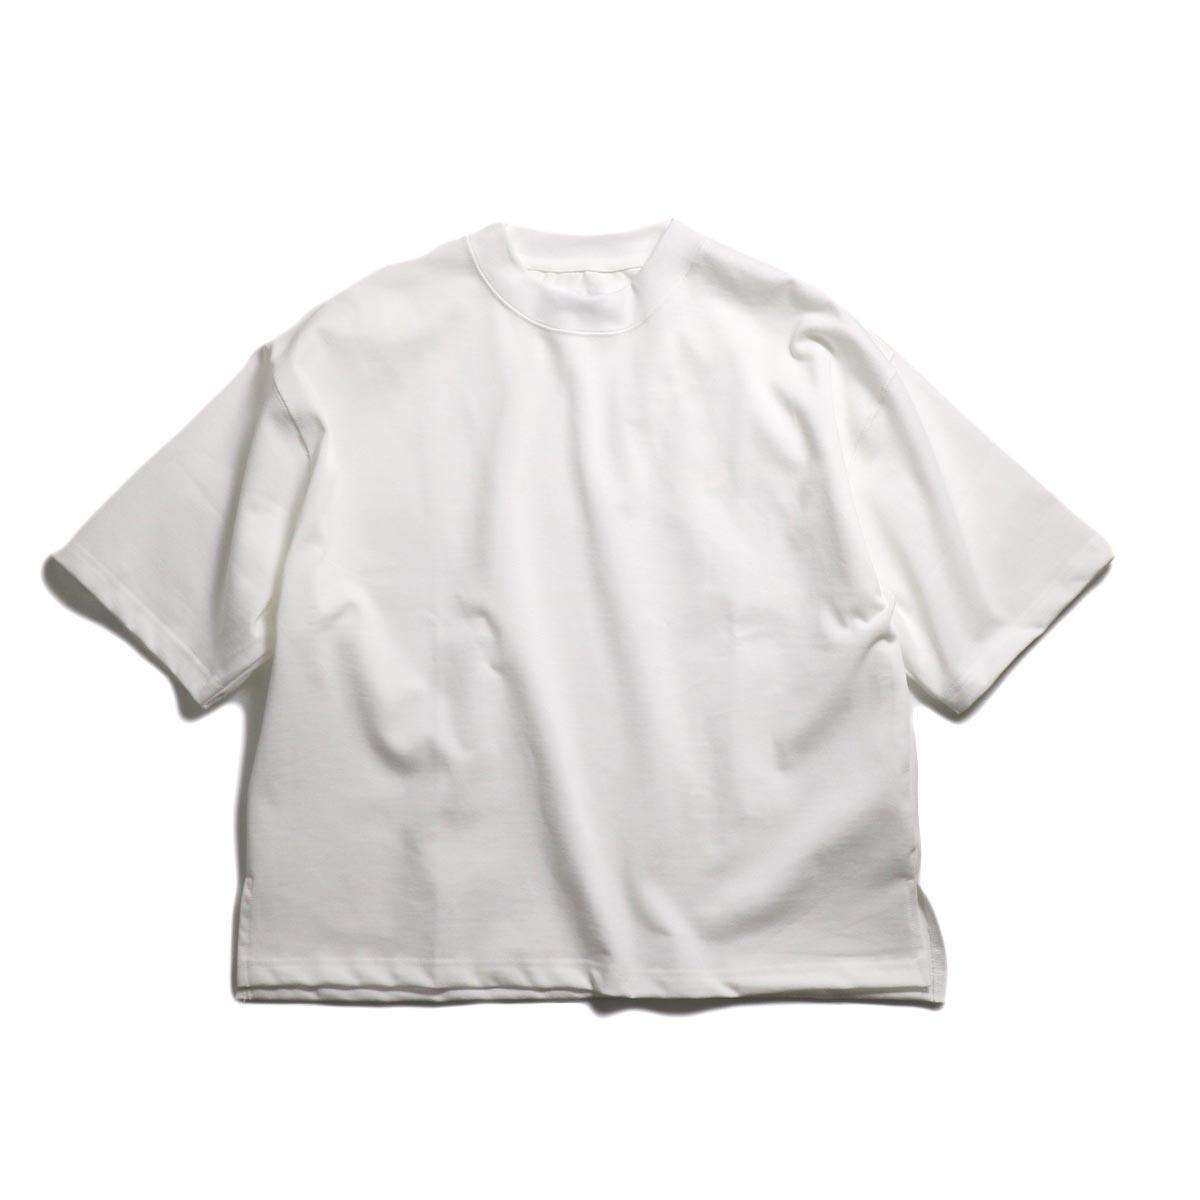 JANE SMITH / Big T Shirt -White